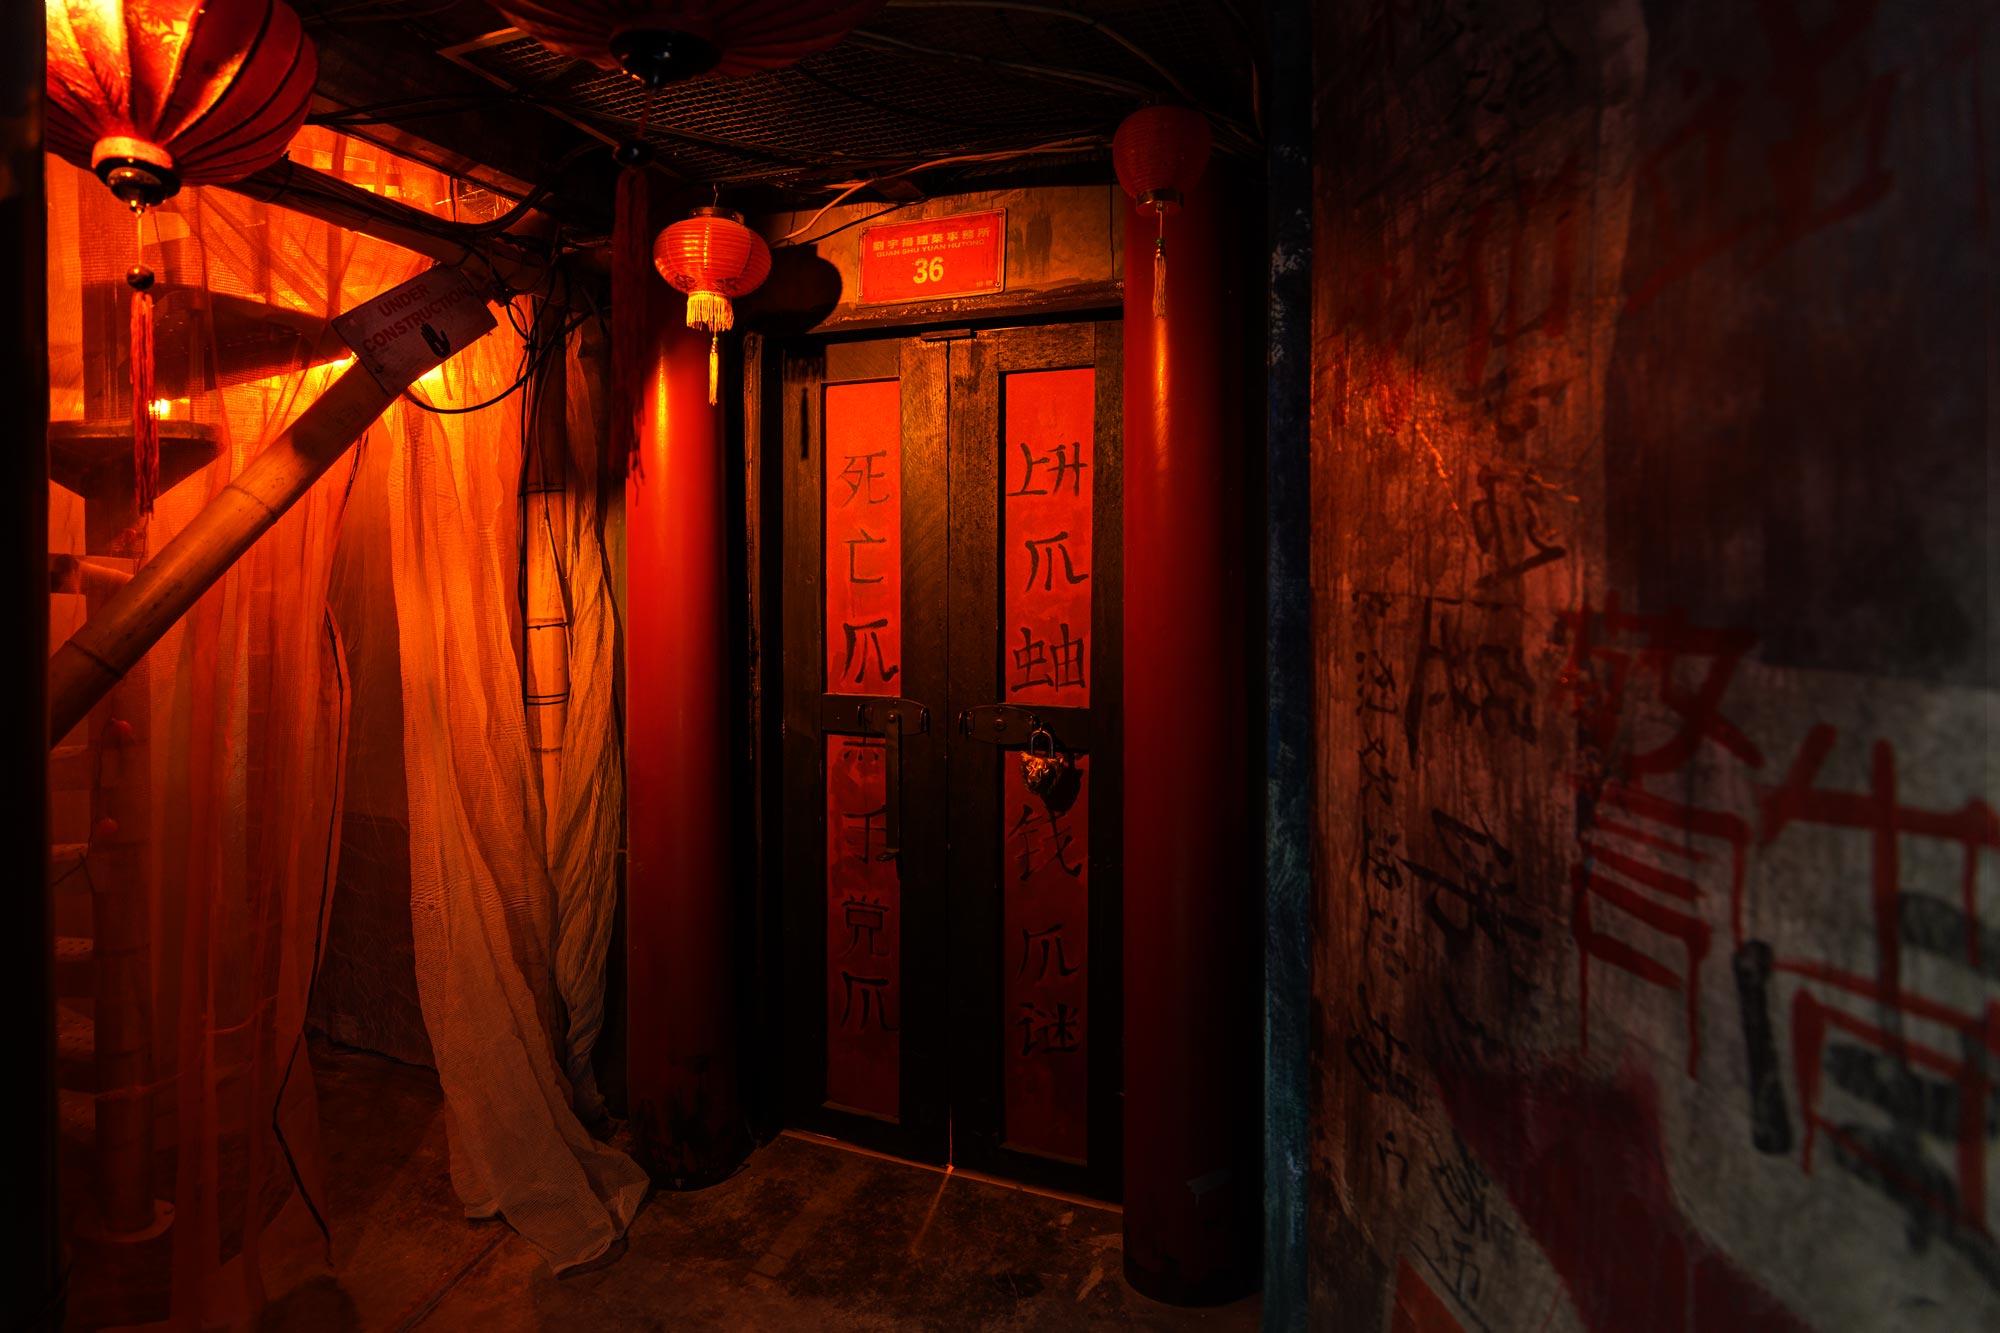 Versus Game House Of Tales Escape Room In Berlin